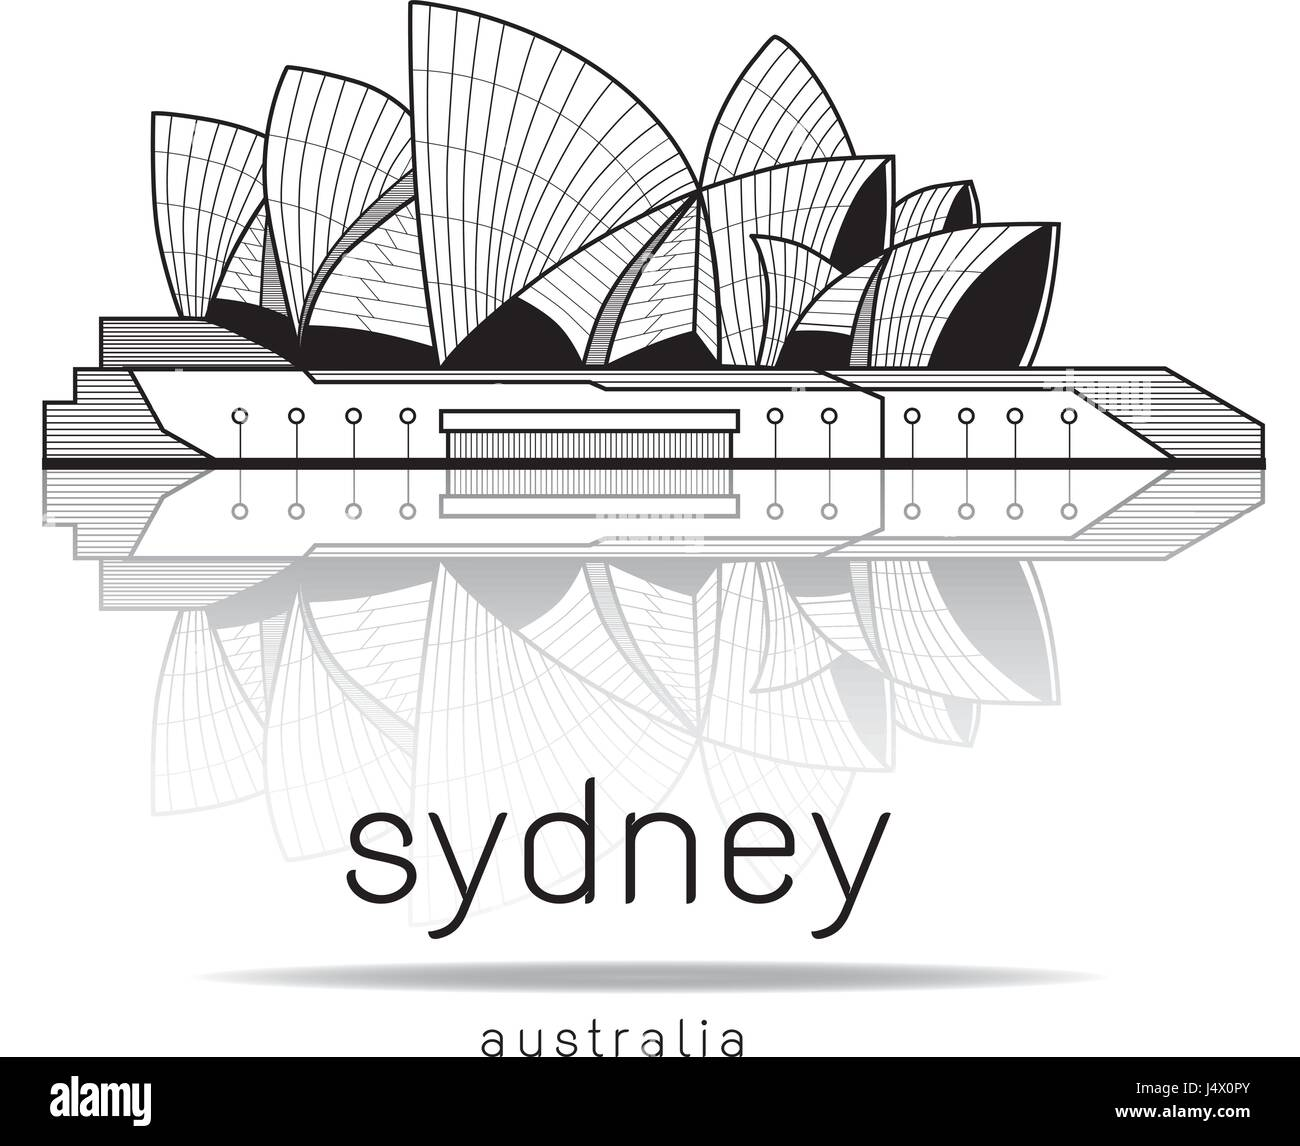 Draw A Houseplan Sydney Opera House Australia Illustration Vector Design